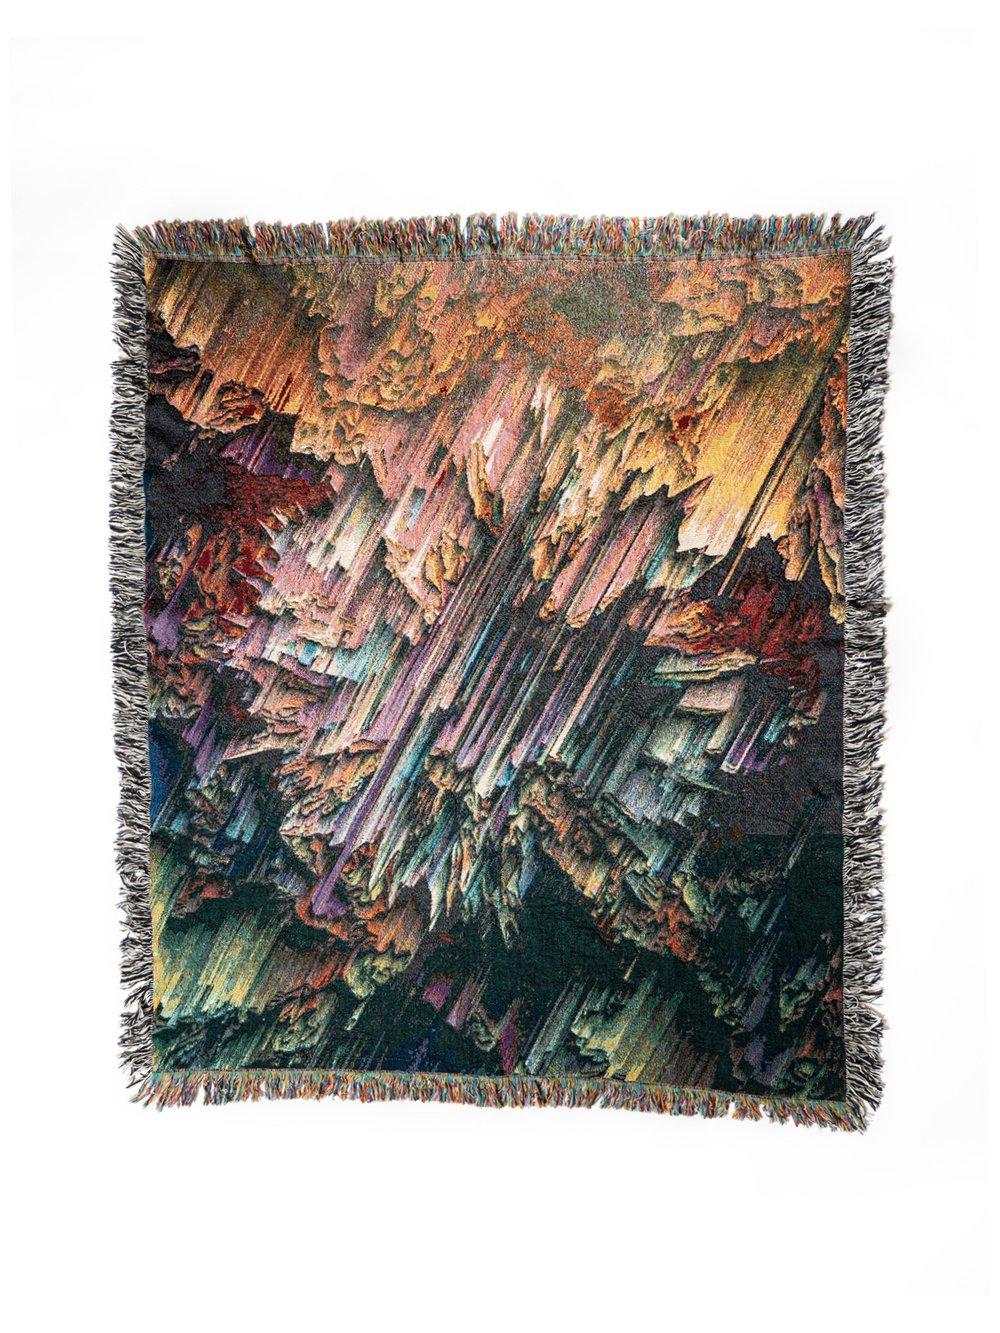 Woven Blanket #27